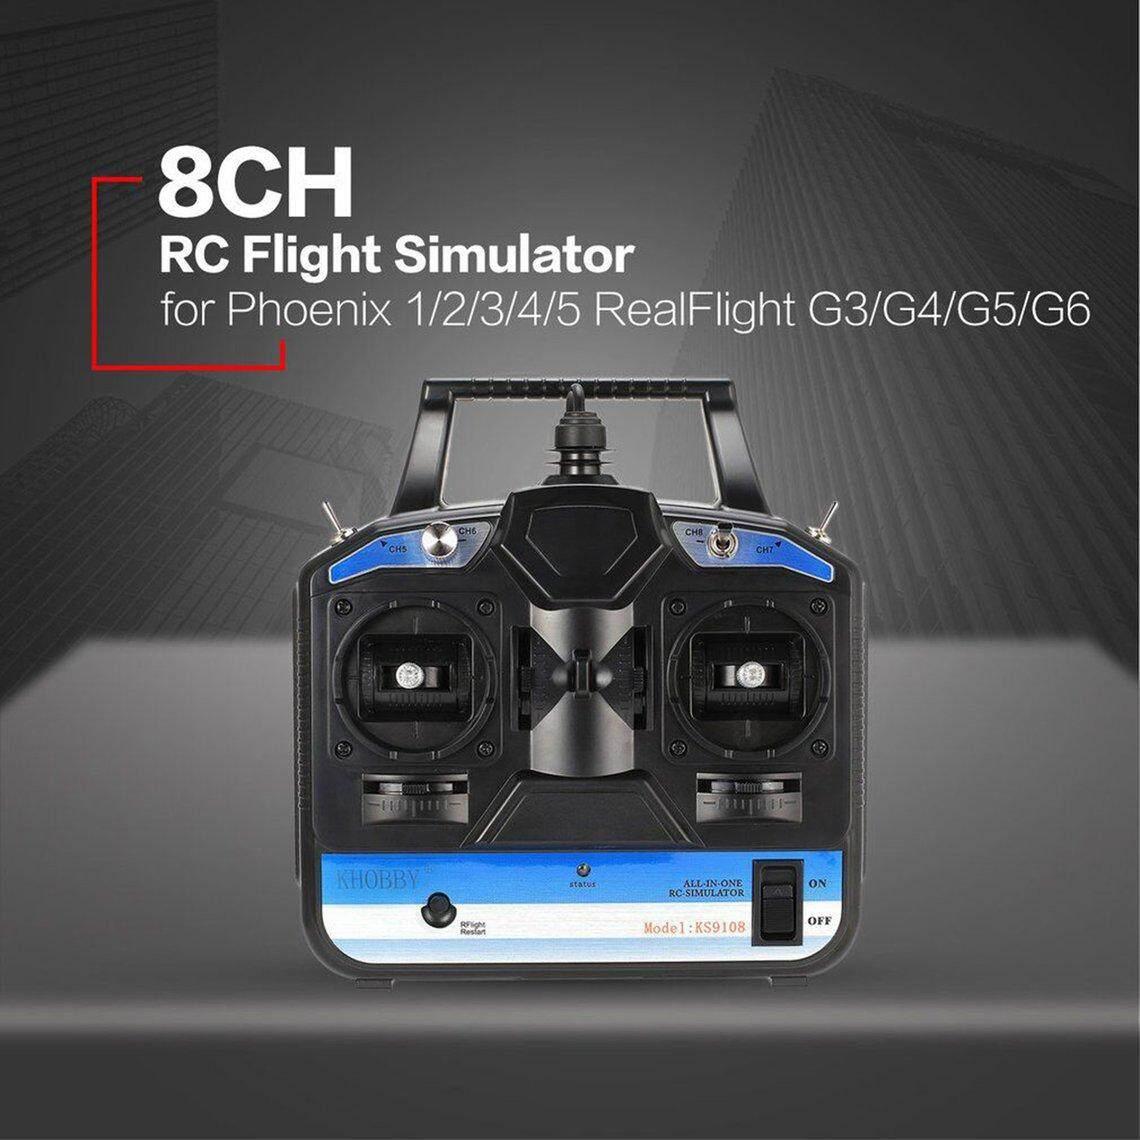 Best Discount 8CH RC Flight Simulator RC Transmitter for Phoenix 5 0  RealFlightG3/G4/G5/G6